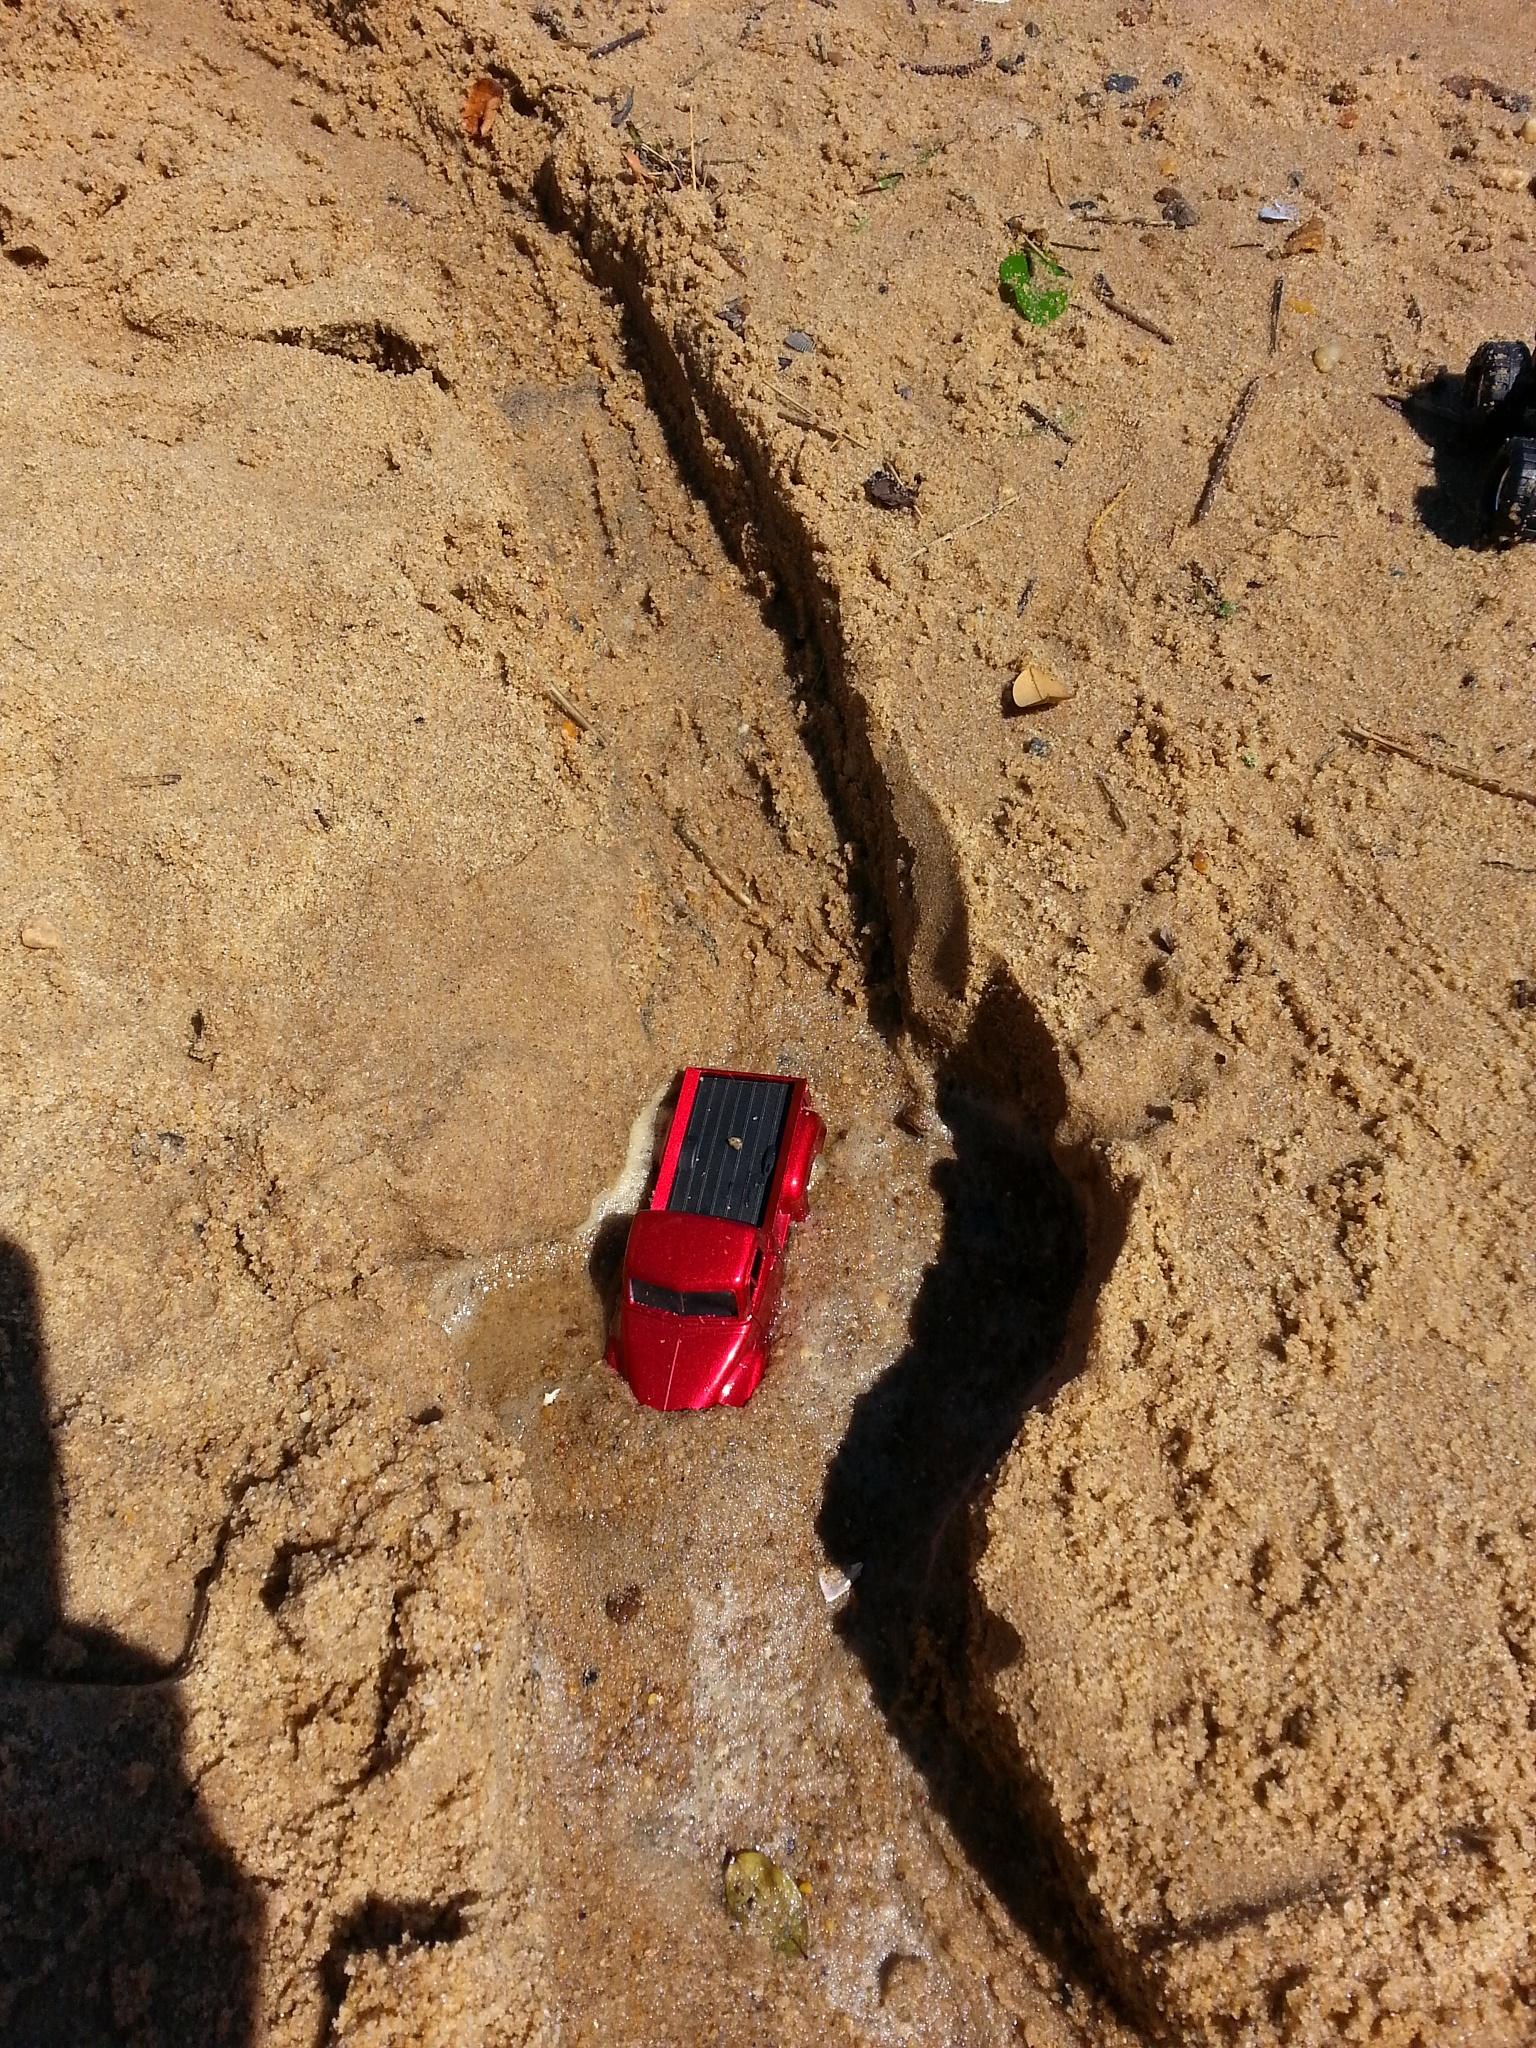 Grandson's truck is stuck in the sand. by Wayne Wilkinson